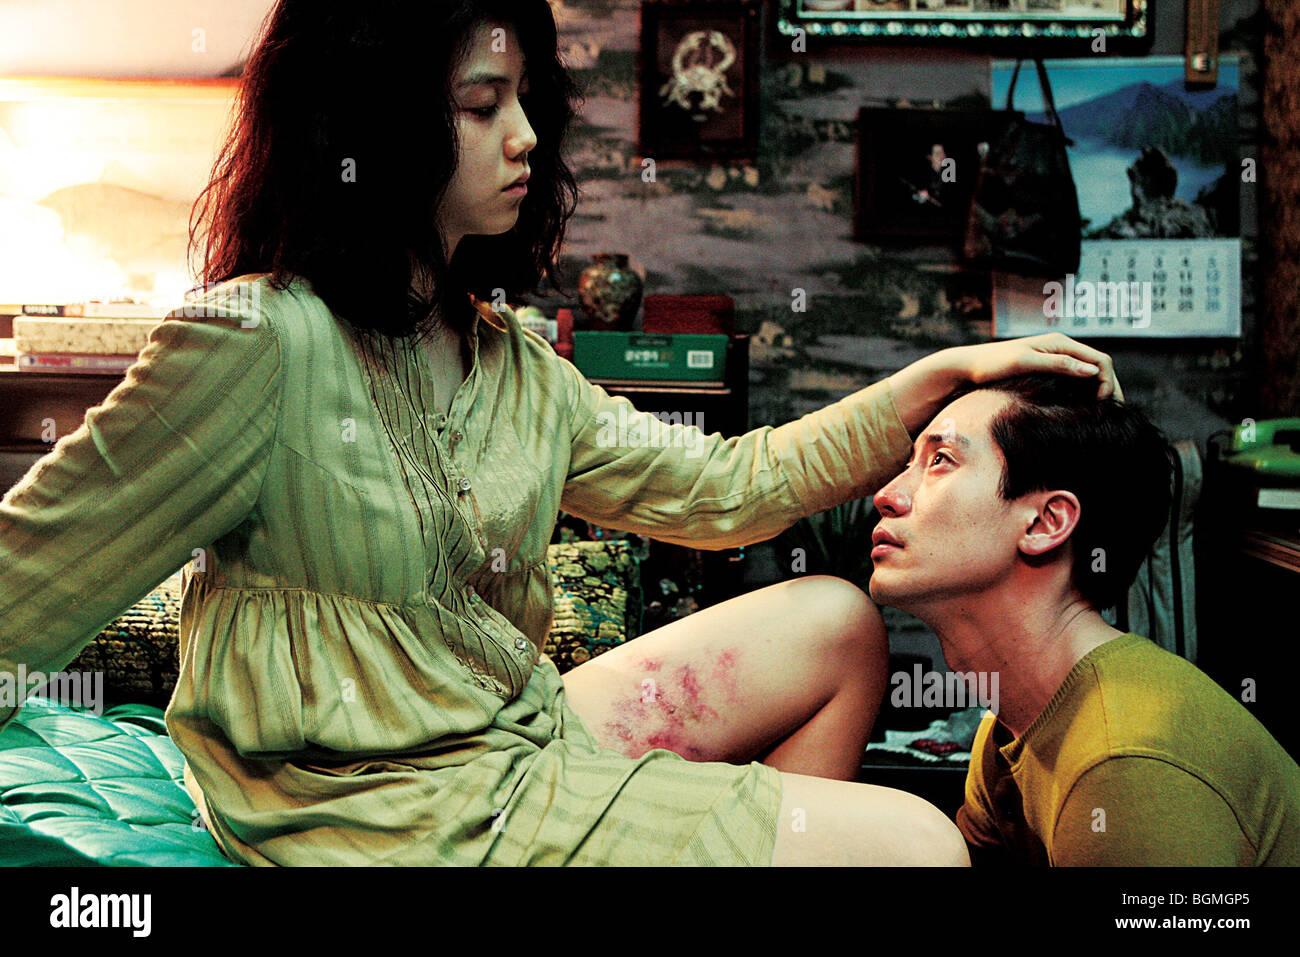 Bakjwi  Thirst Year : 2009 South Korea Director : Park Chan-wook Kim Ok-vin, Song Kang-Ho, Stock Photo